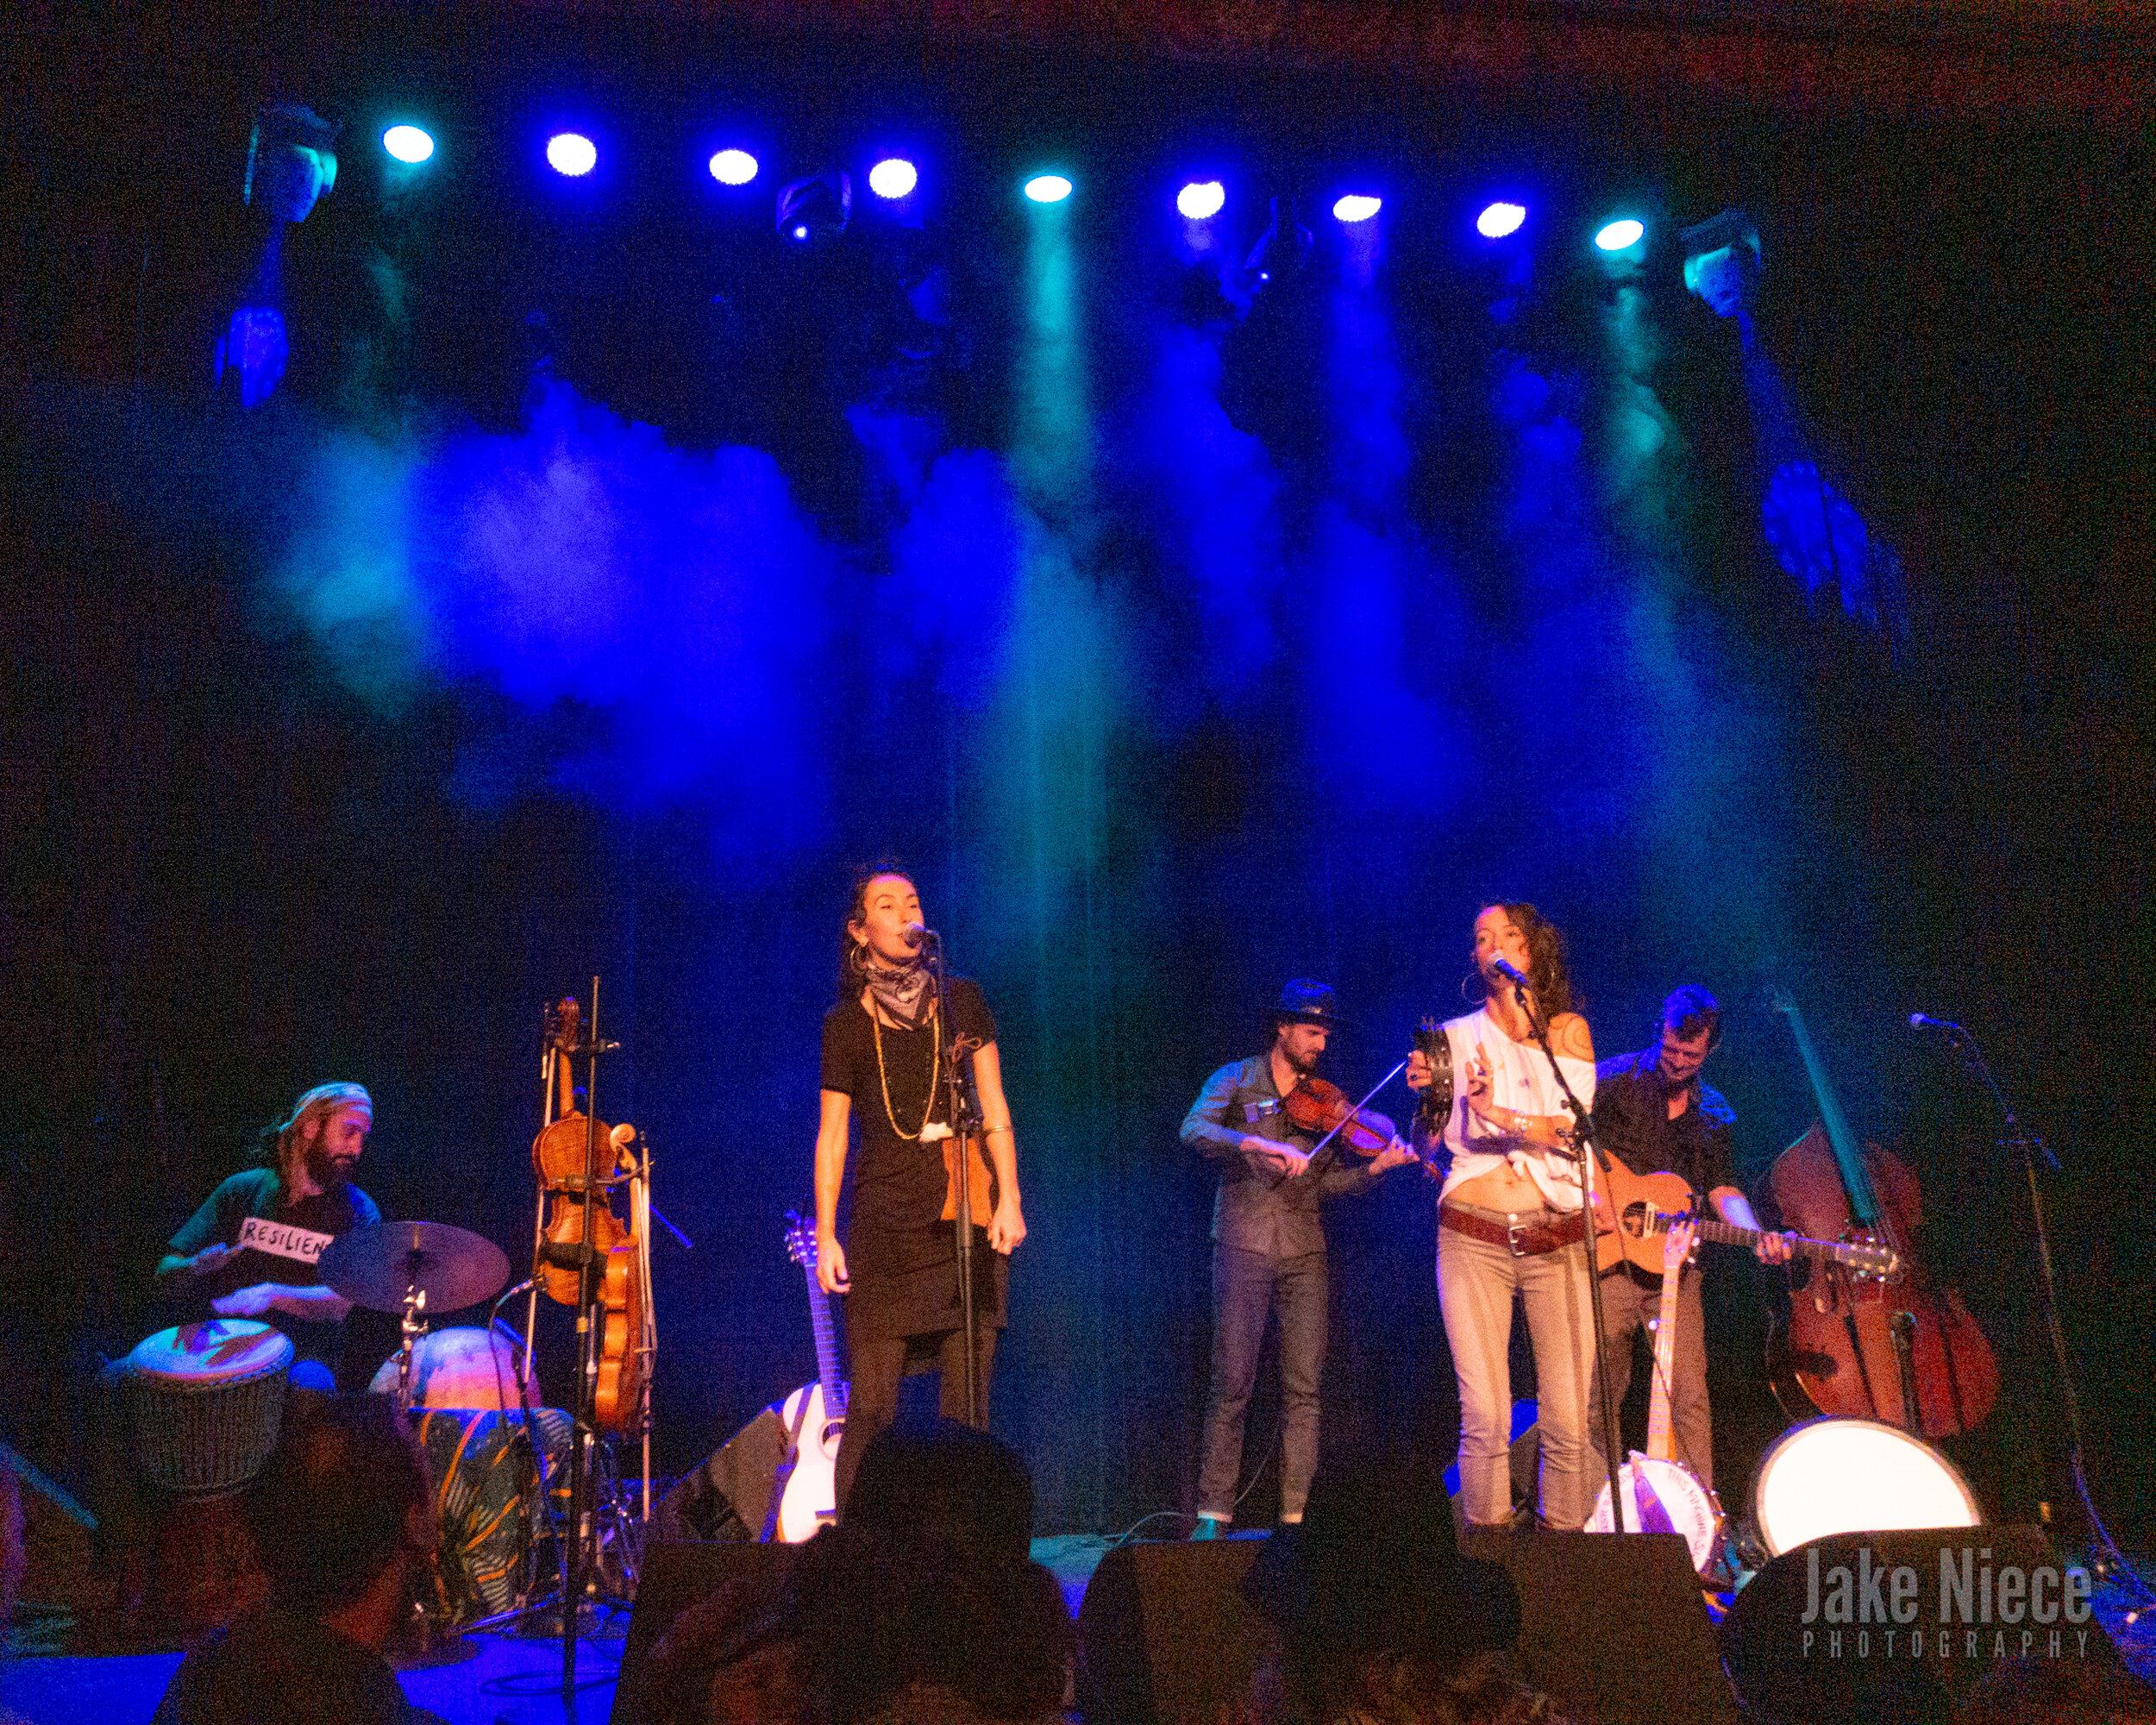 Rising Appalachia at the Sheridan Opera House in Telluride, Colo